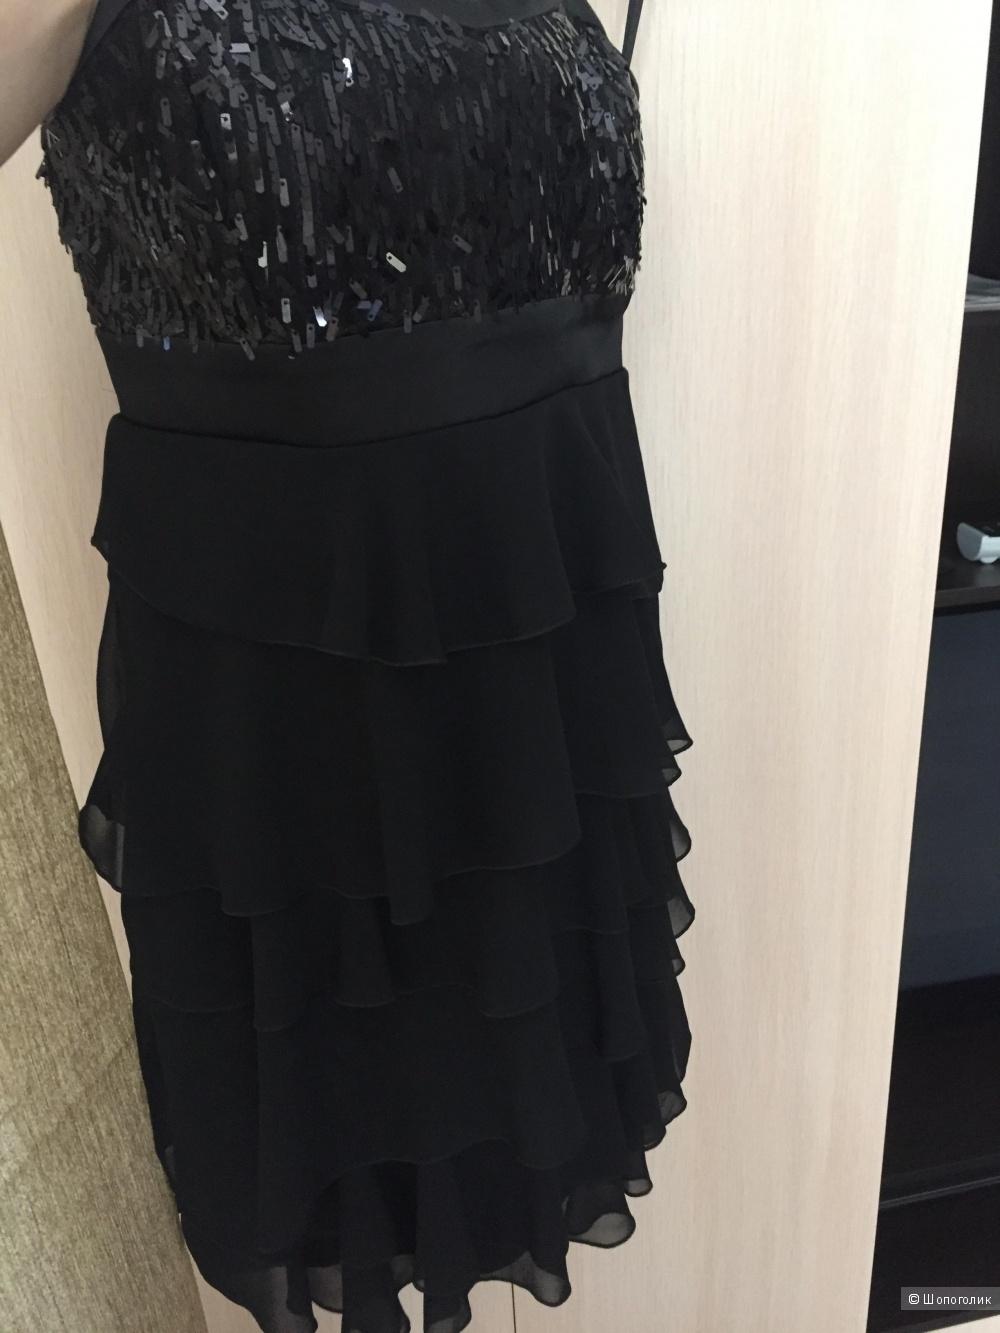 Вечернее платье на брителях, 40-42 размер, Comely